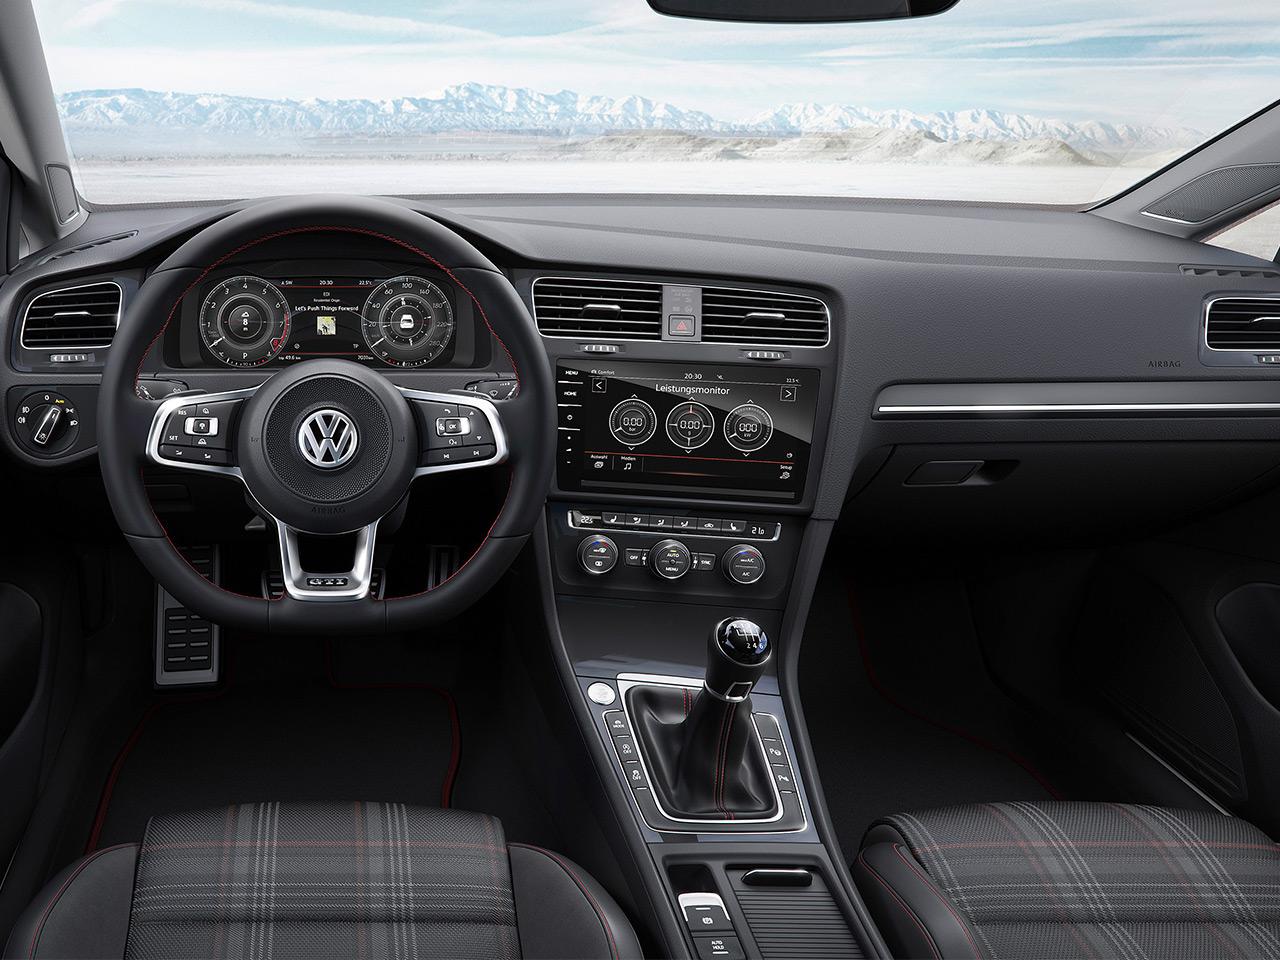 Golf Gti Performance 2017 >> Vw Golf 7 Gti Facelift 2017 Preis Motor Autozeitung De